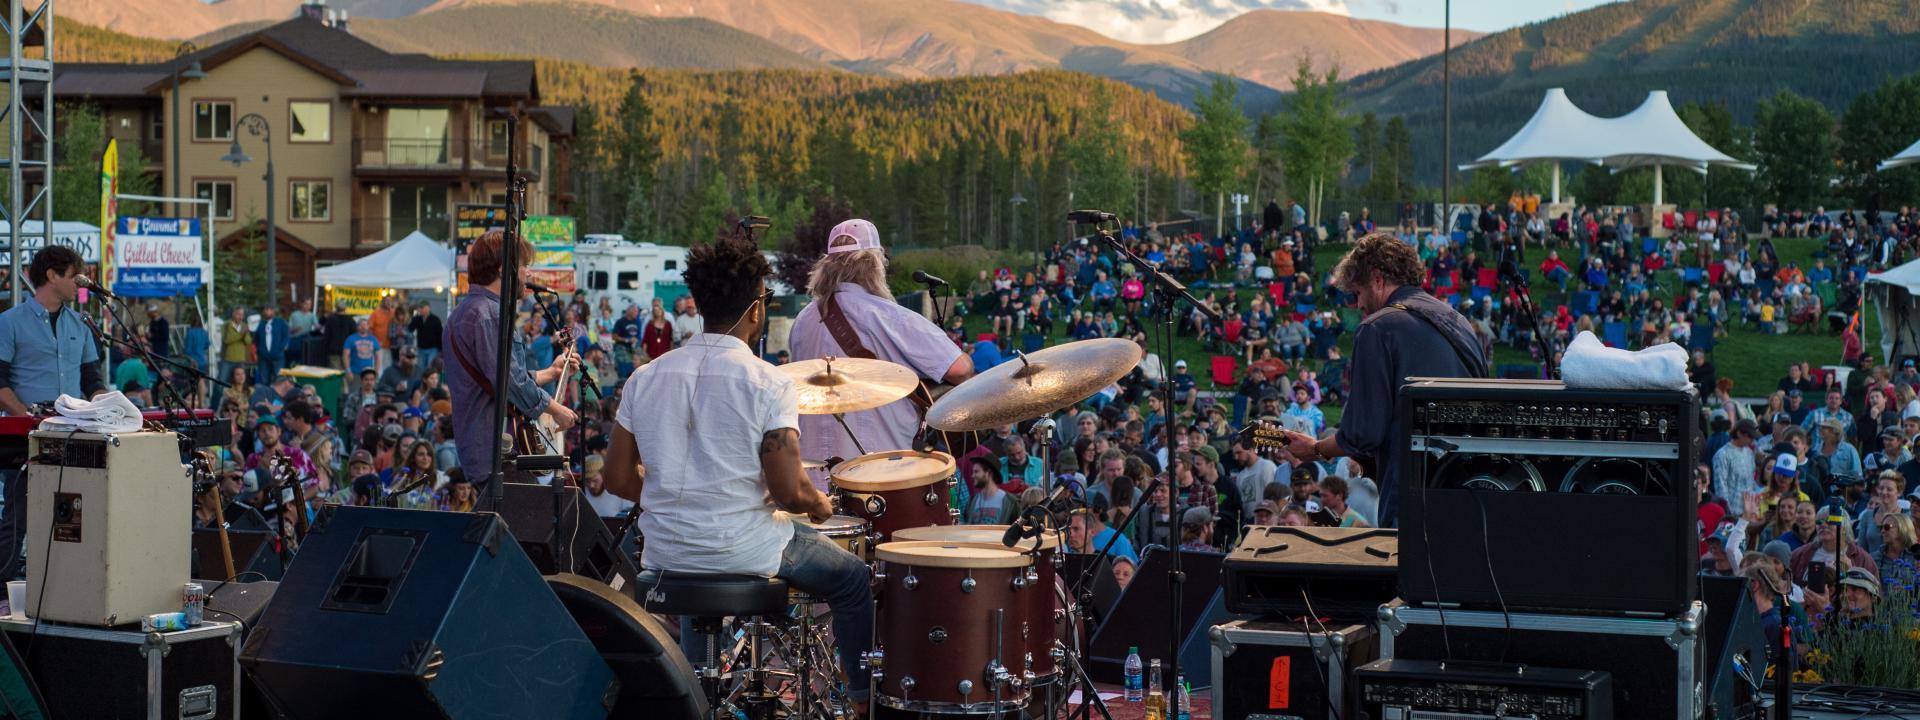 SolShine Music Festival in Winter Park, Colorado